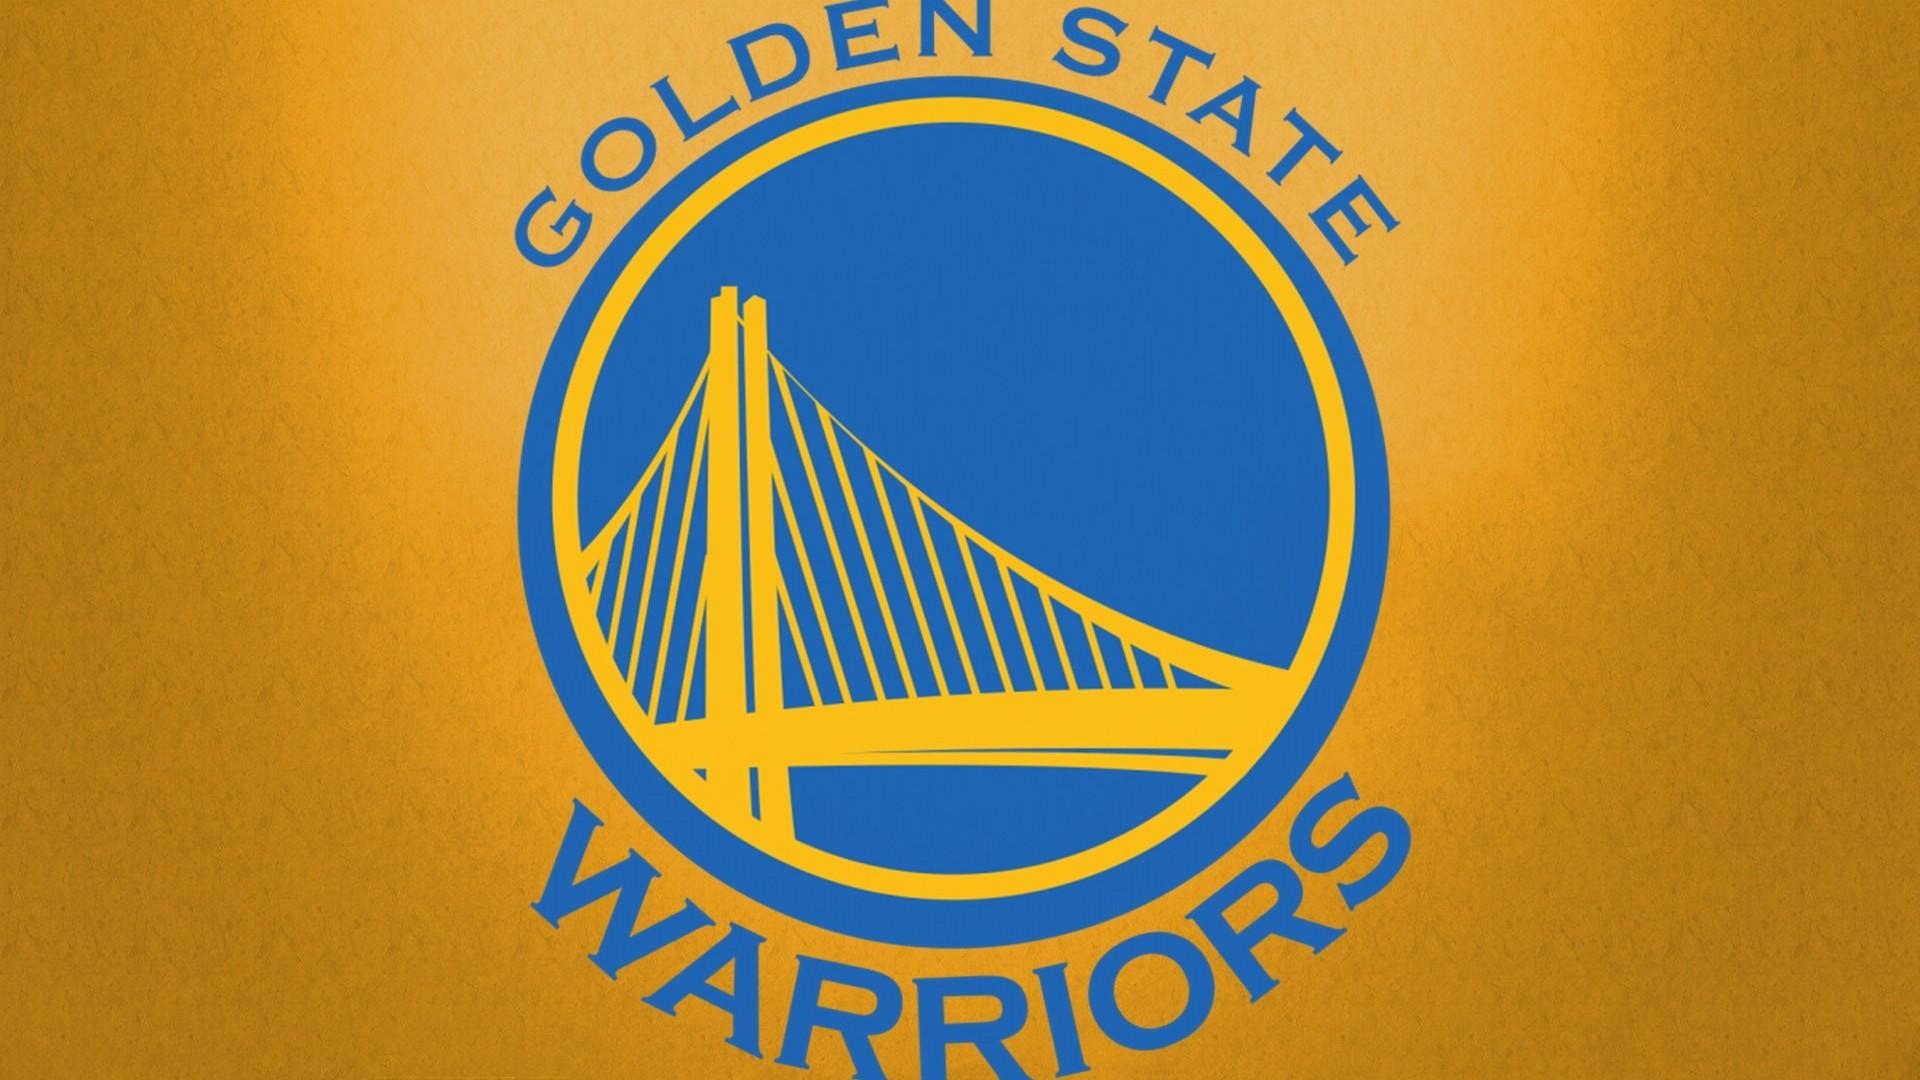 43+ Golden State Warriors Wallpaper HD on WallpaperSafari